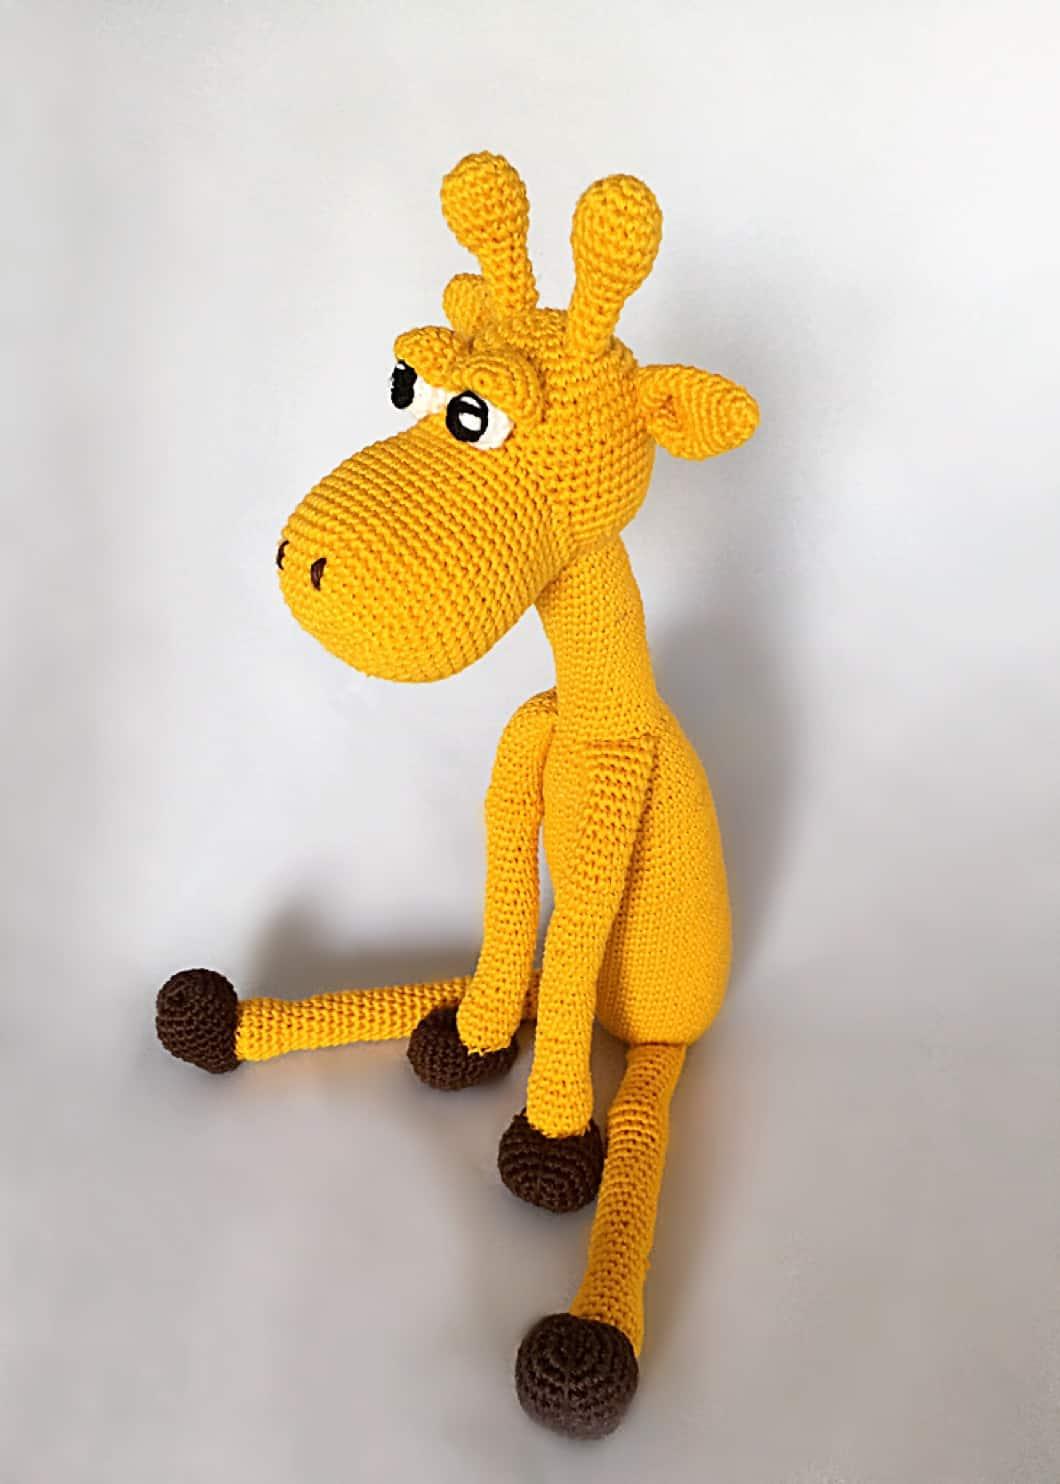 Haakpatroon Giraffe Design By Alinies